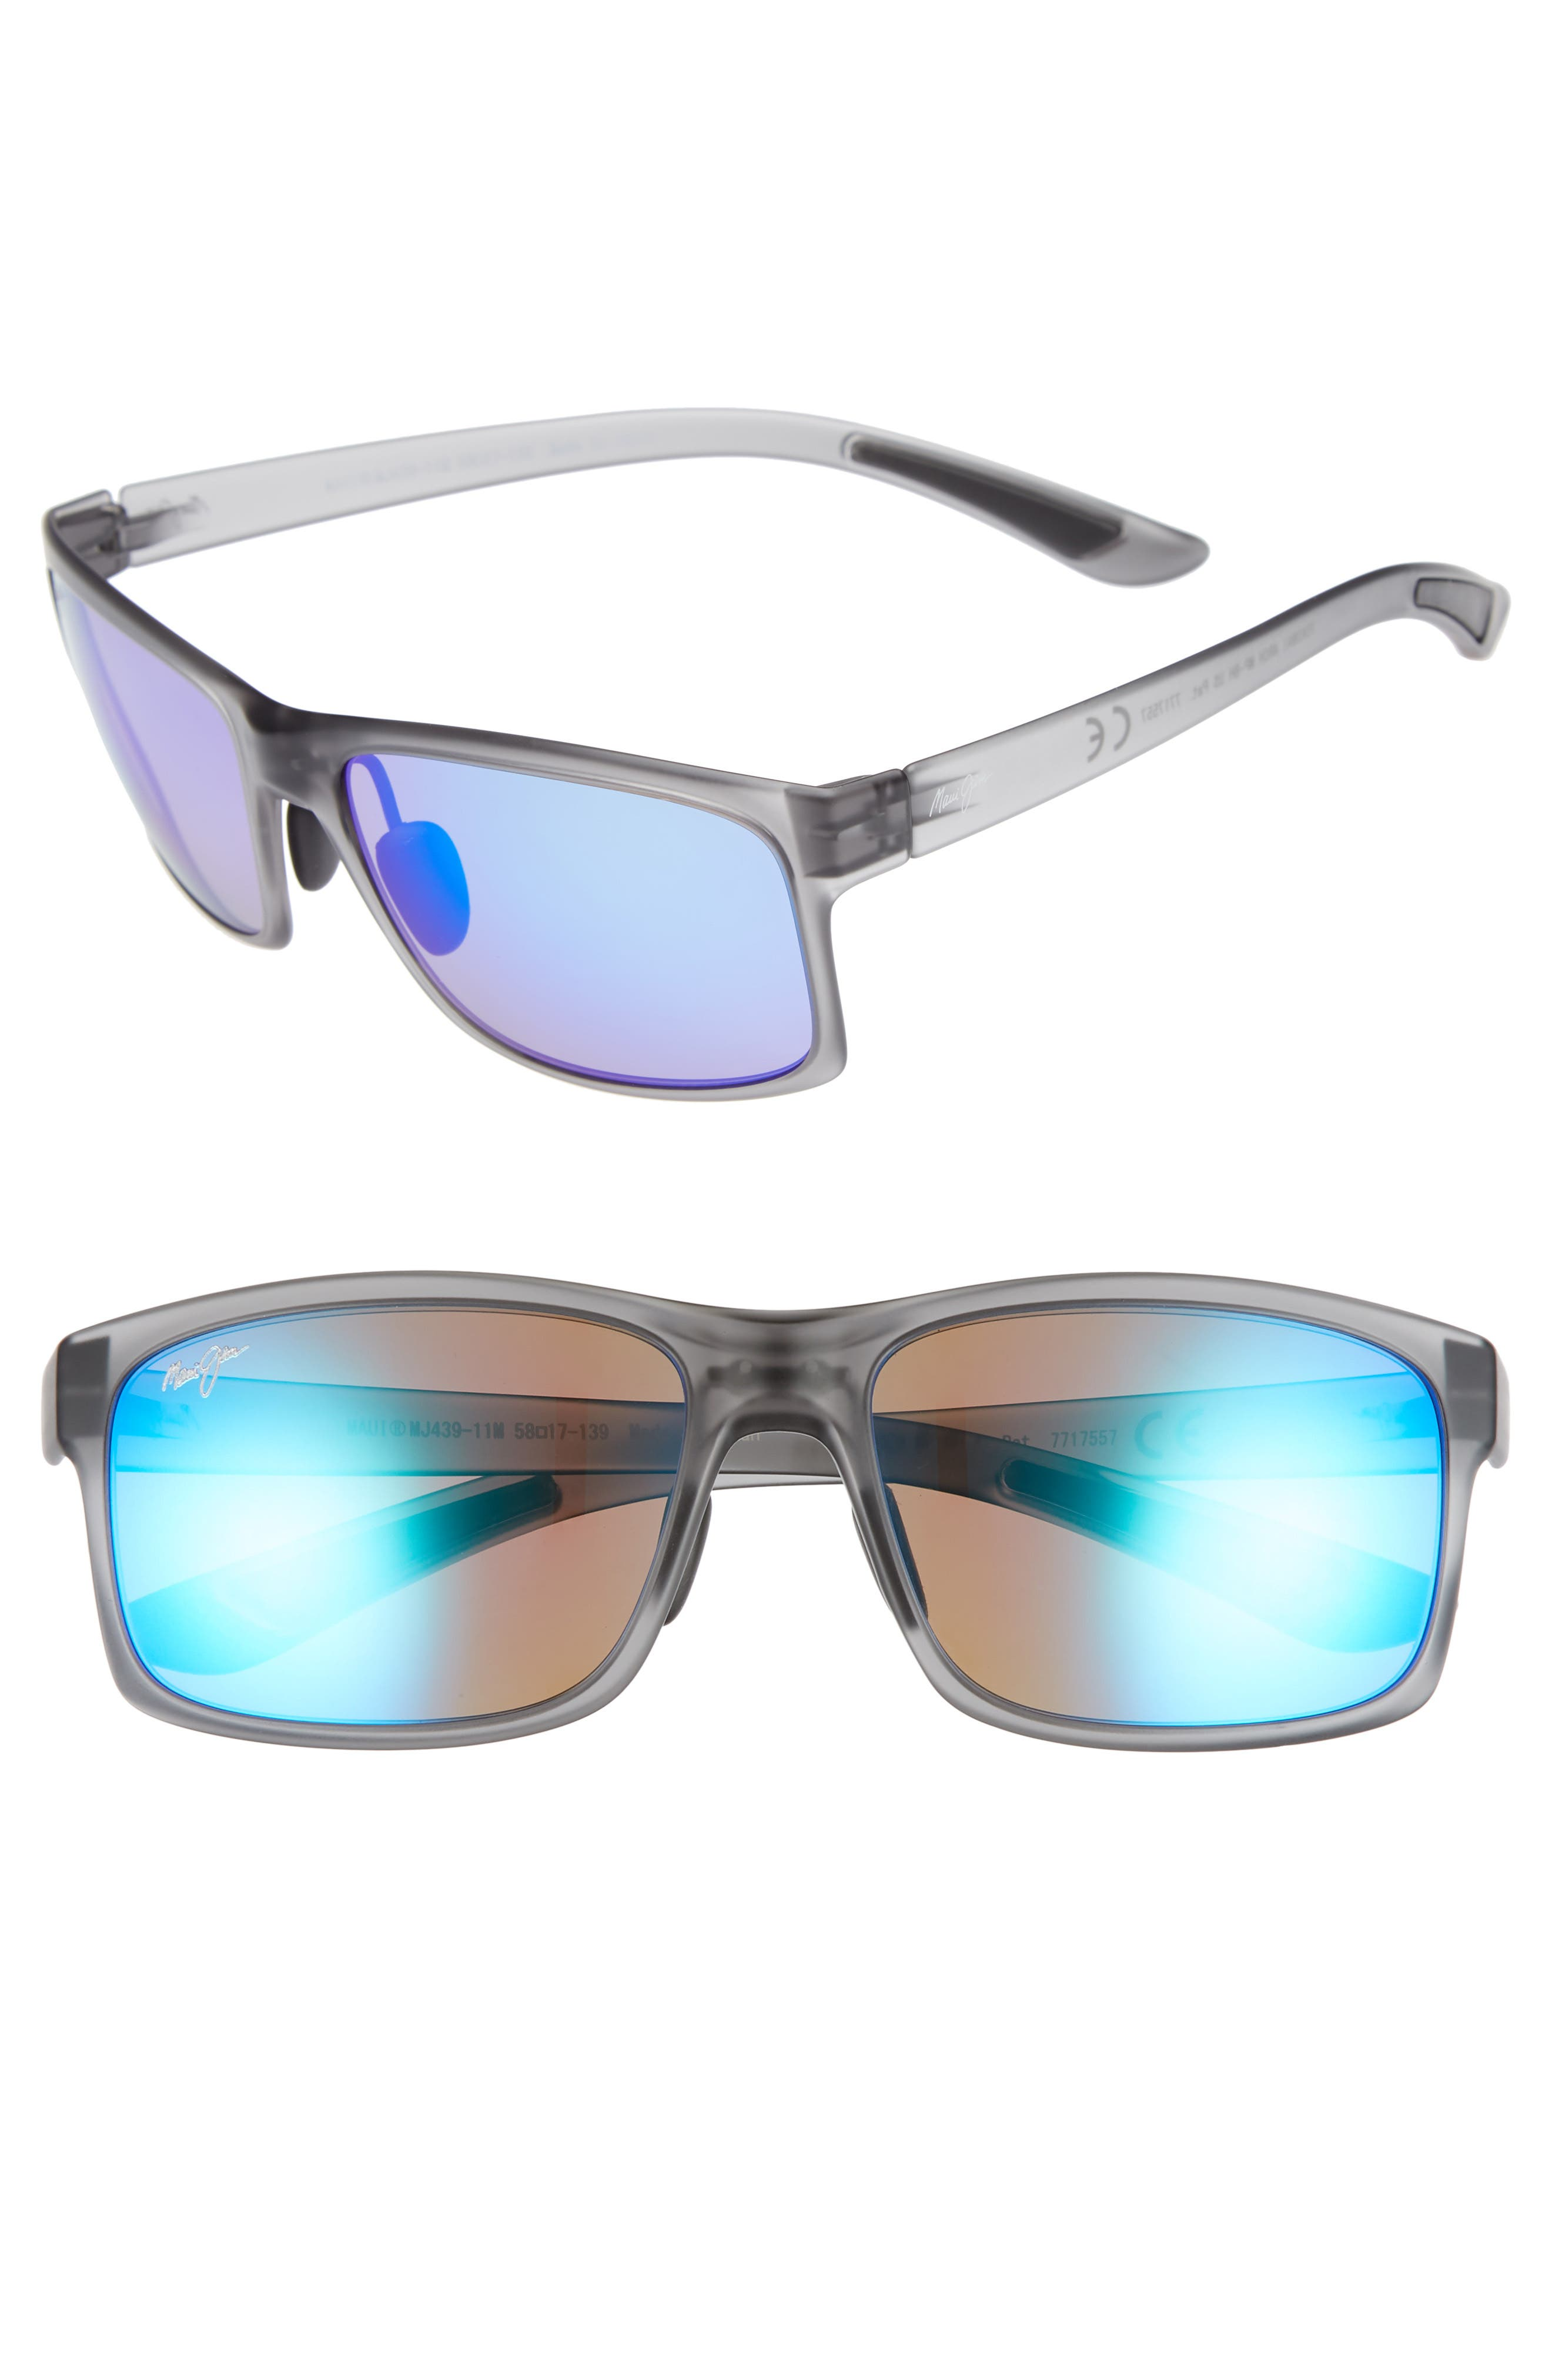 Maui Jim Pokowai Arch 5m Polarized Sunglasses - Translucent Matte Grey/ Blue